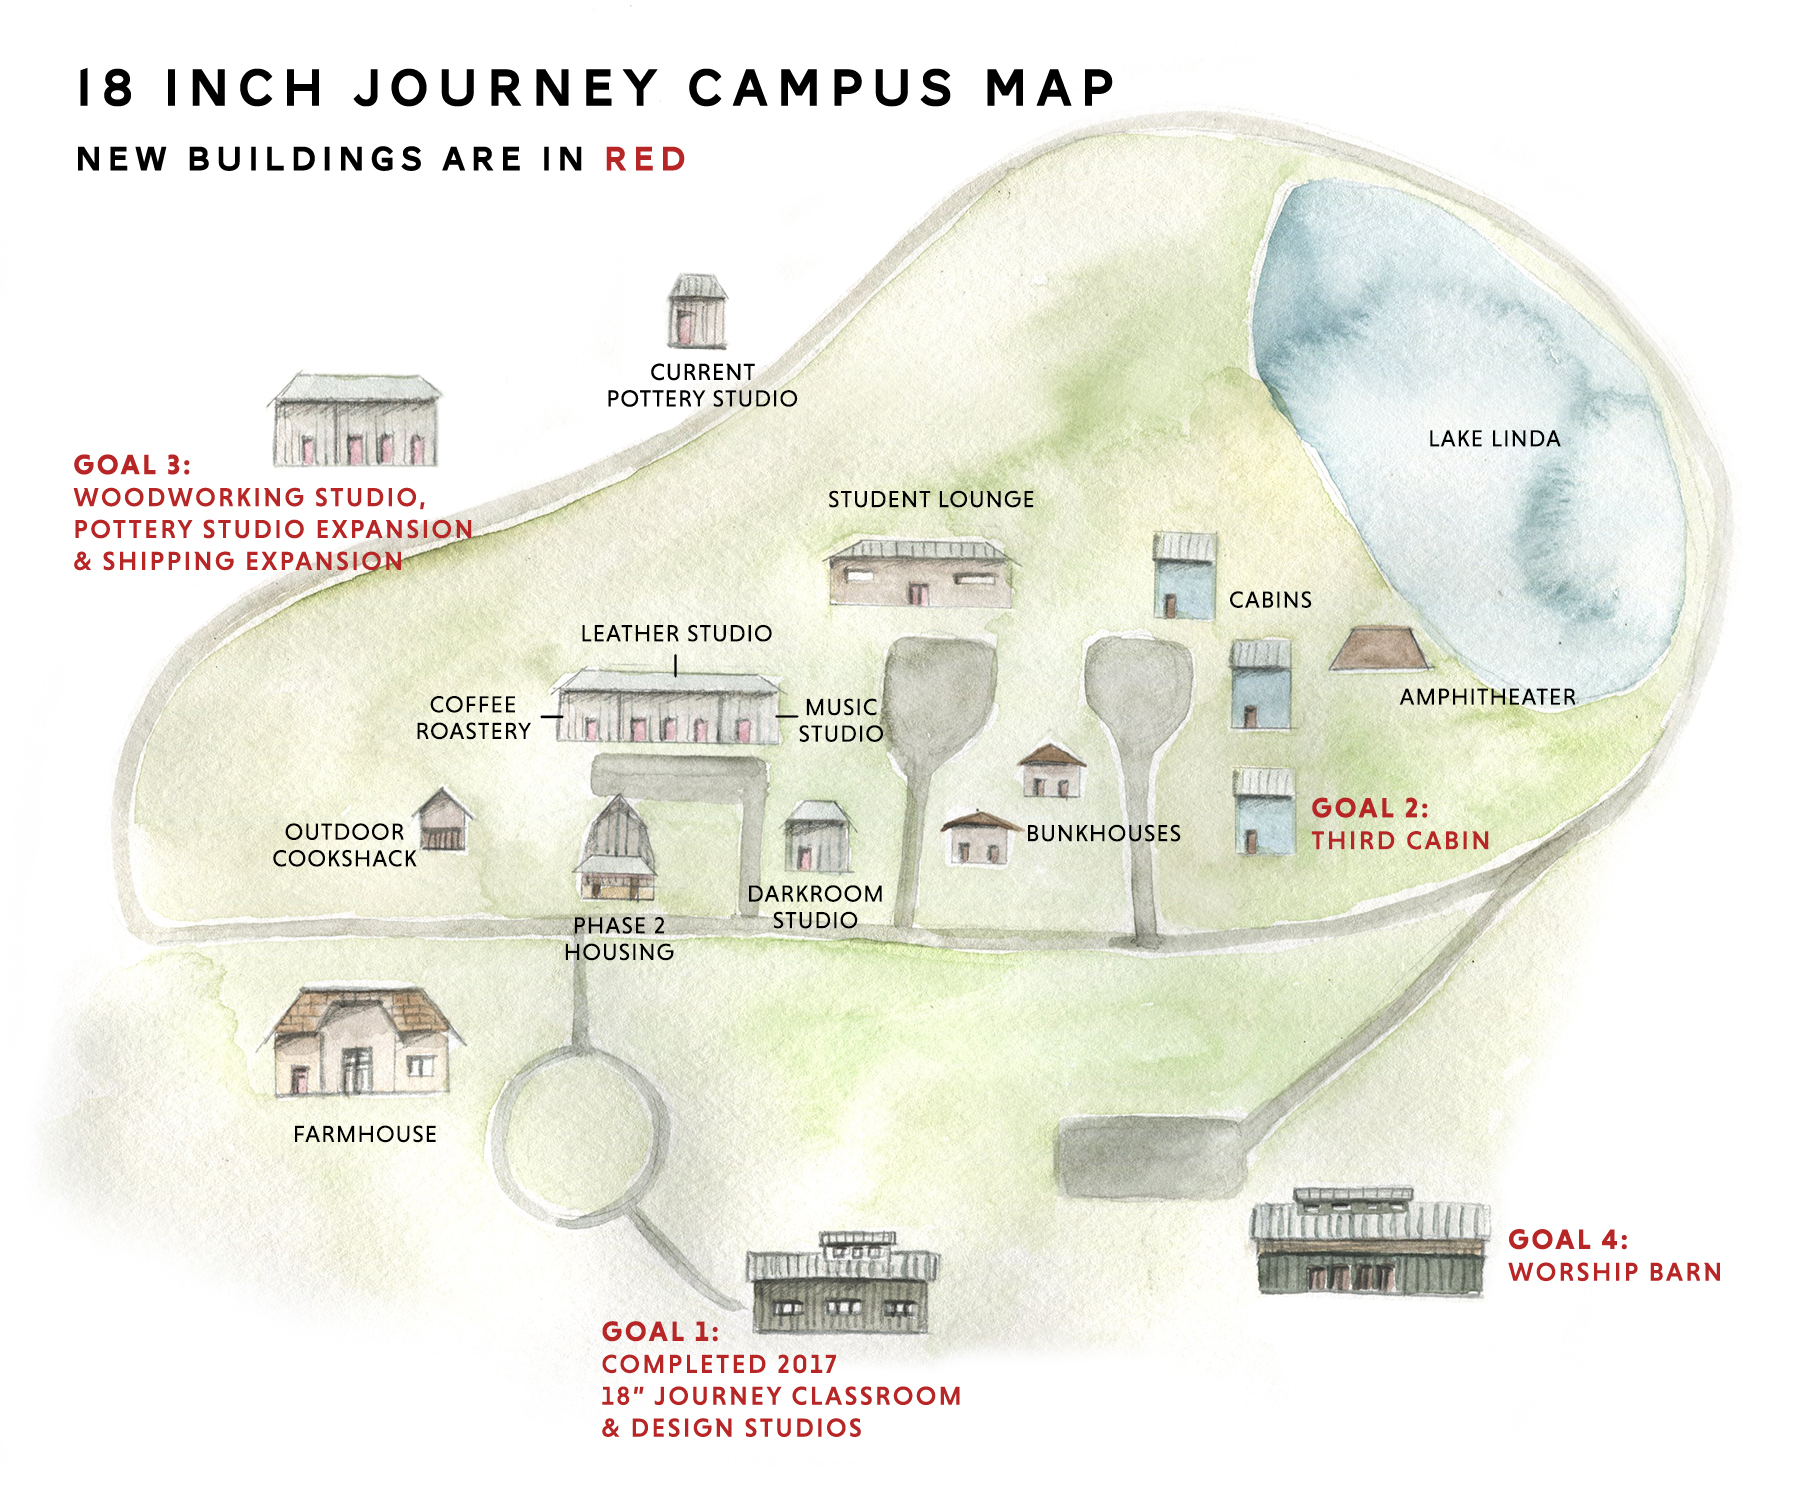 campusmap_goal2ready.jpg